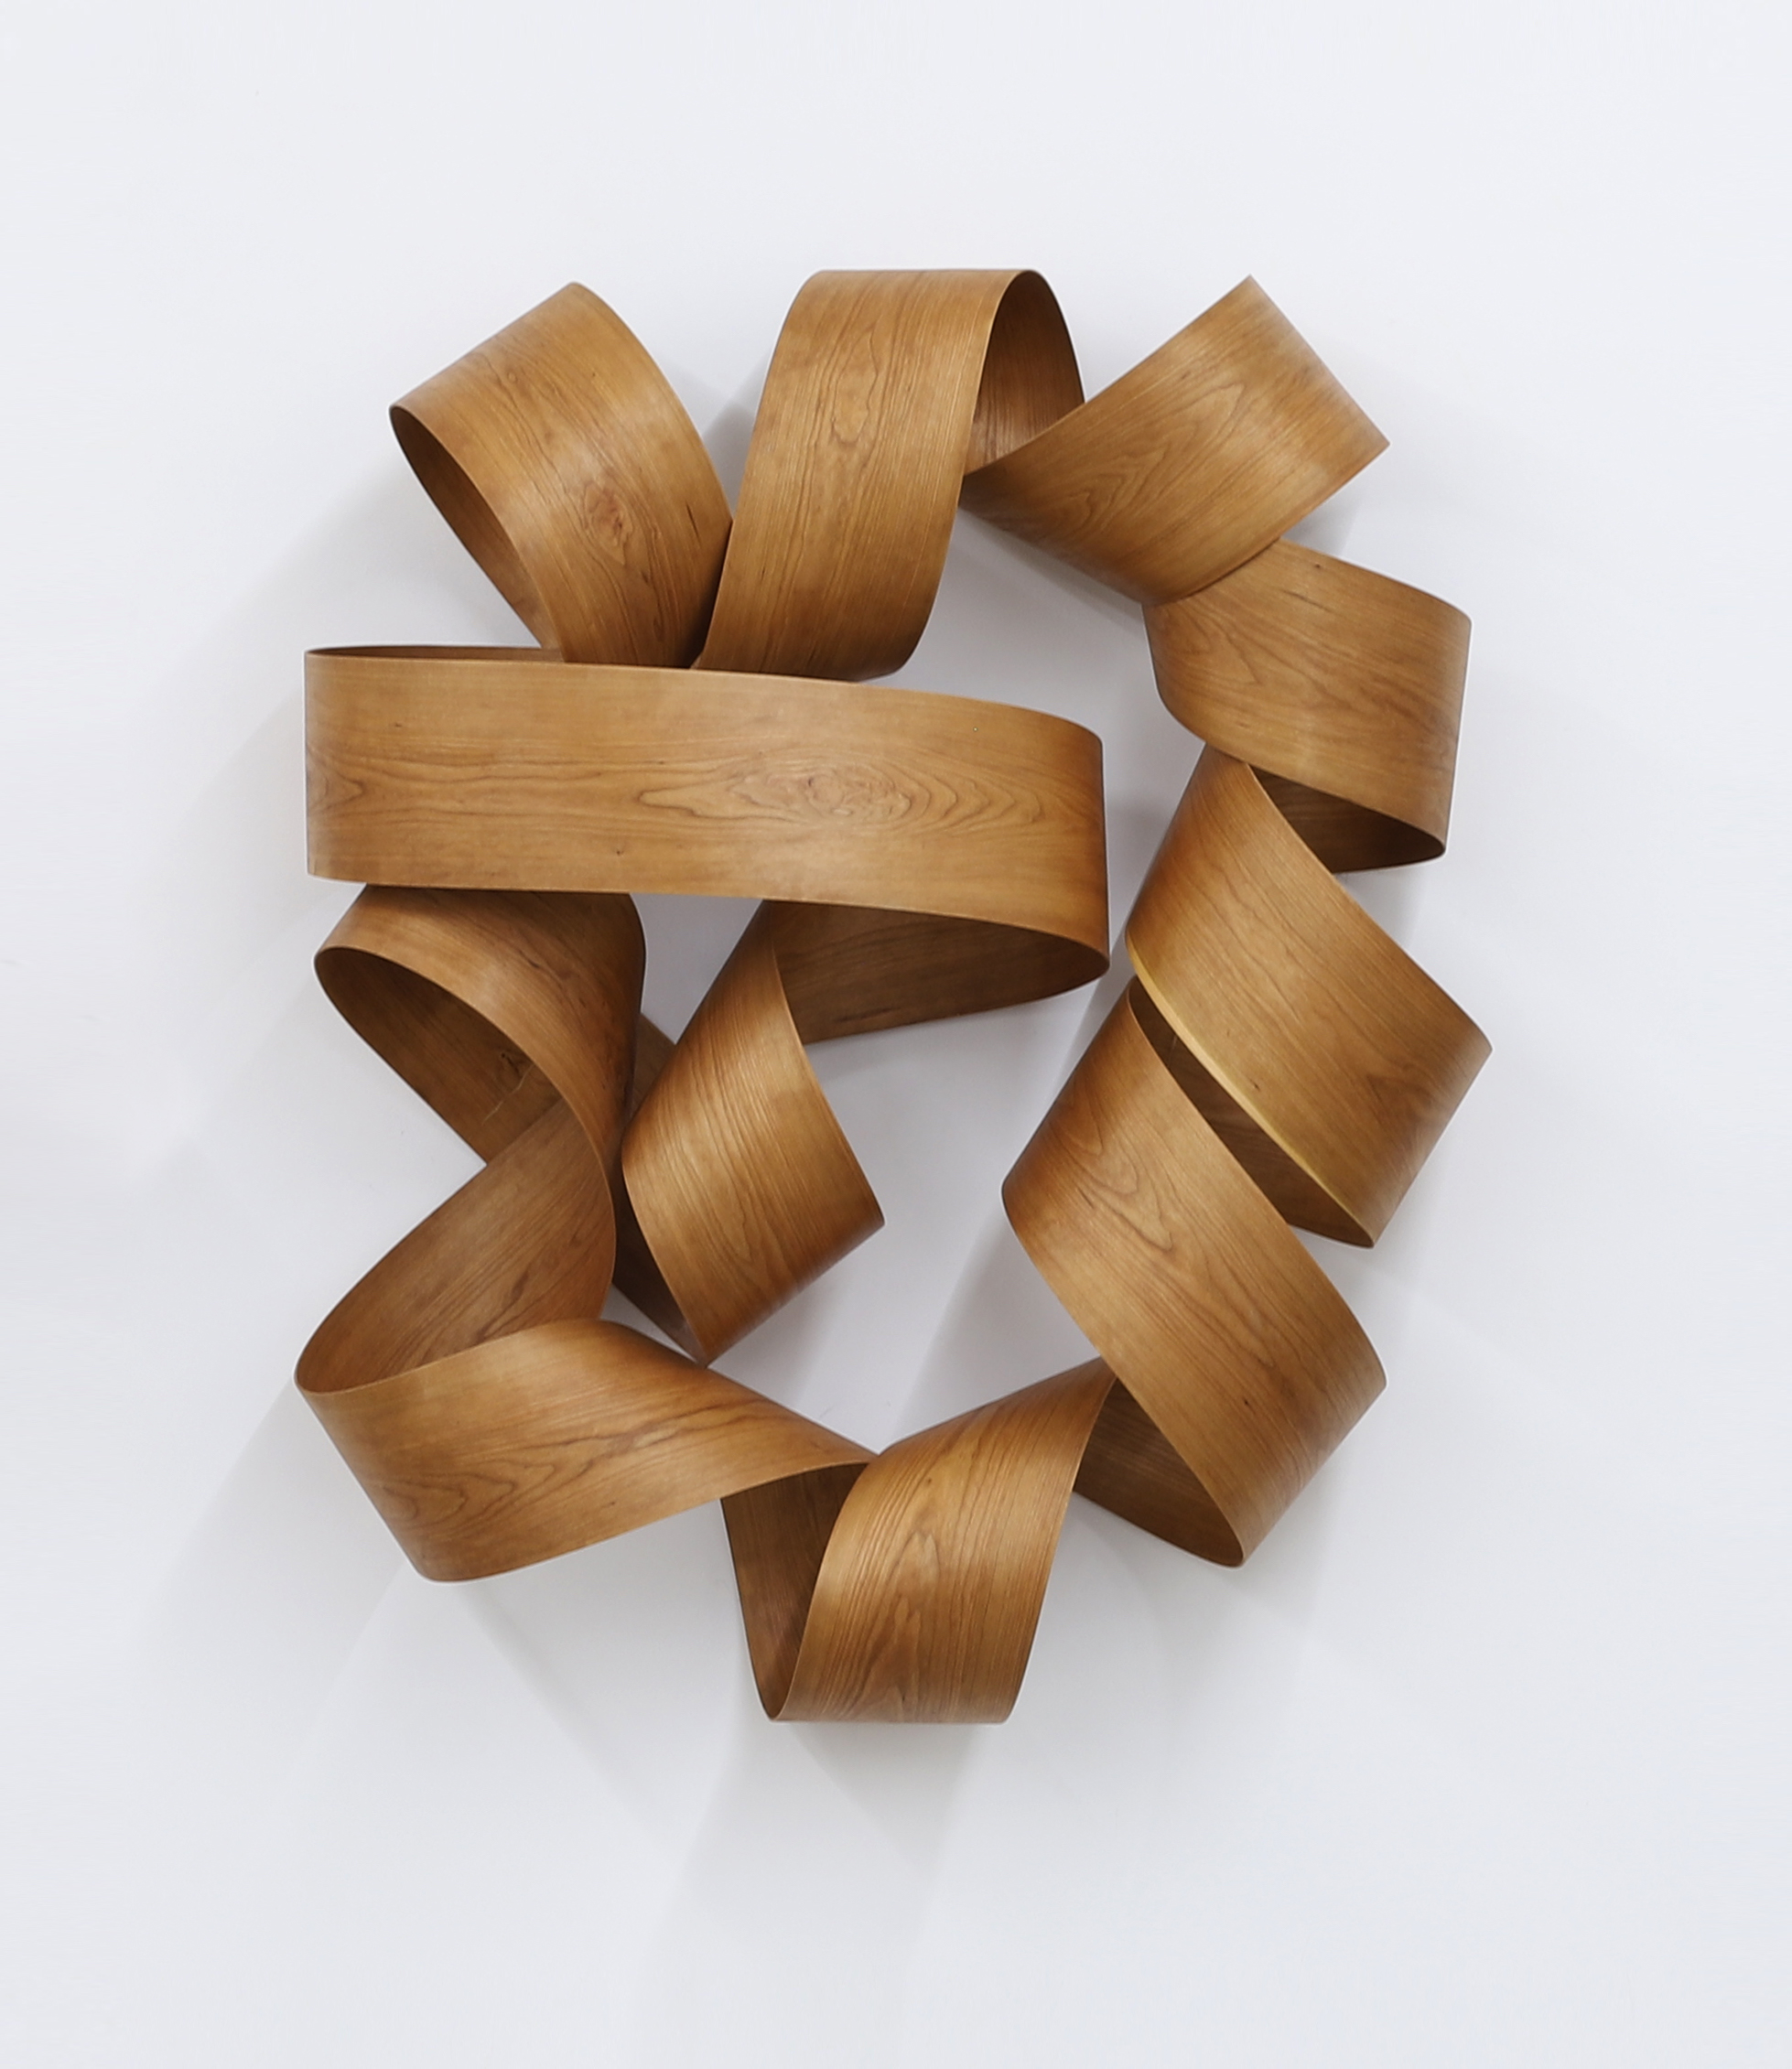 Jeremy Holmes,   Flower , 2018, Black Cherry hardwood, 49 x 39 x 14 inches